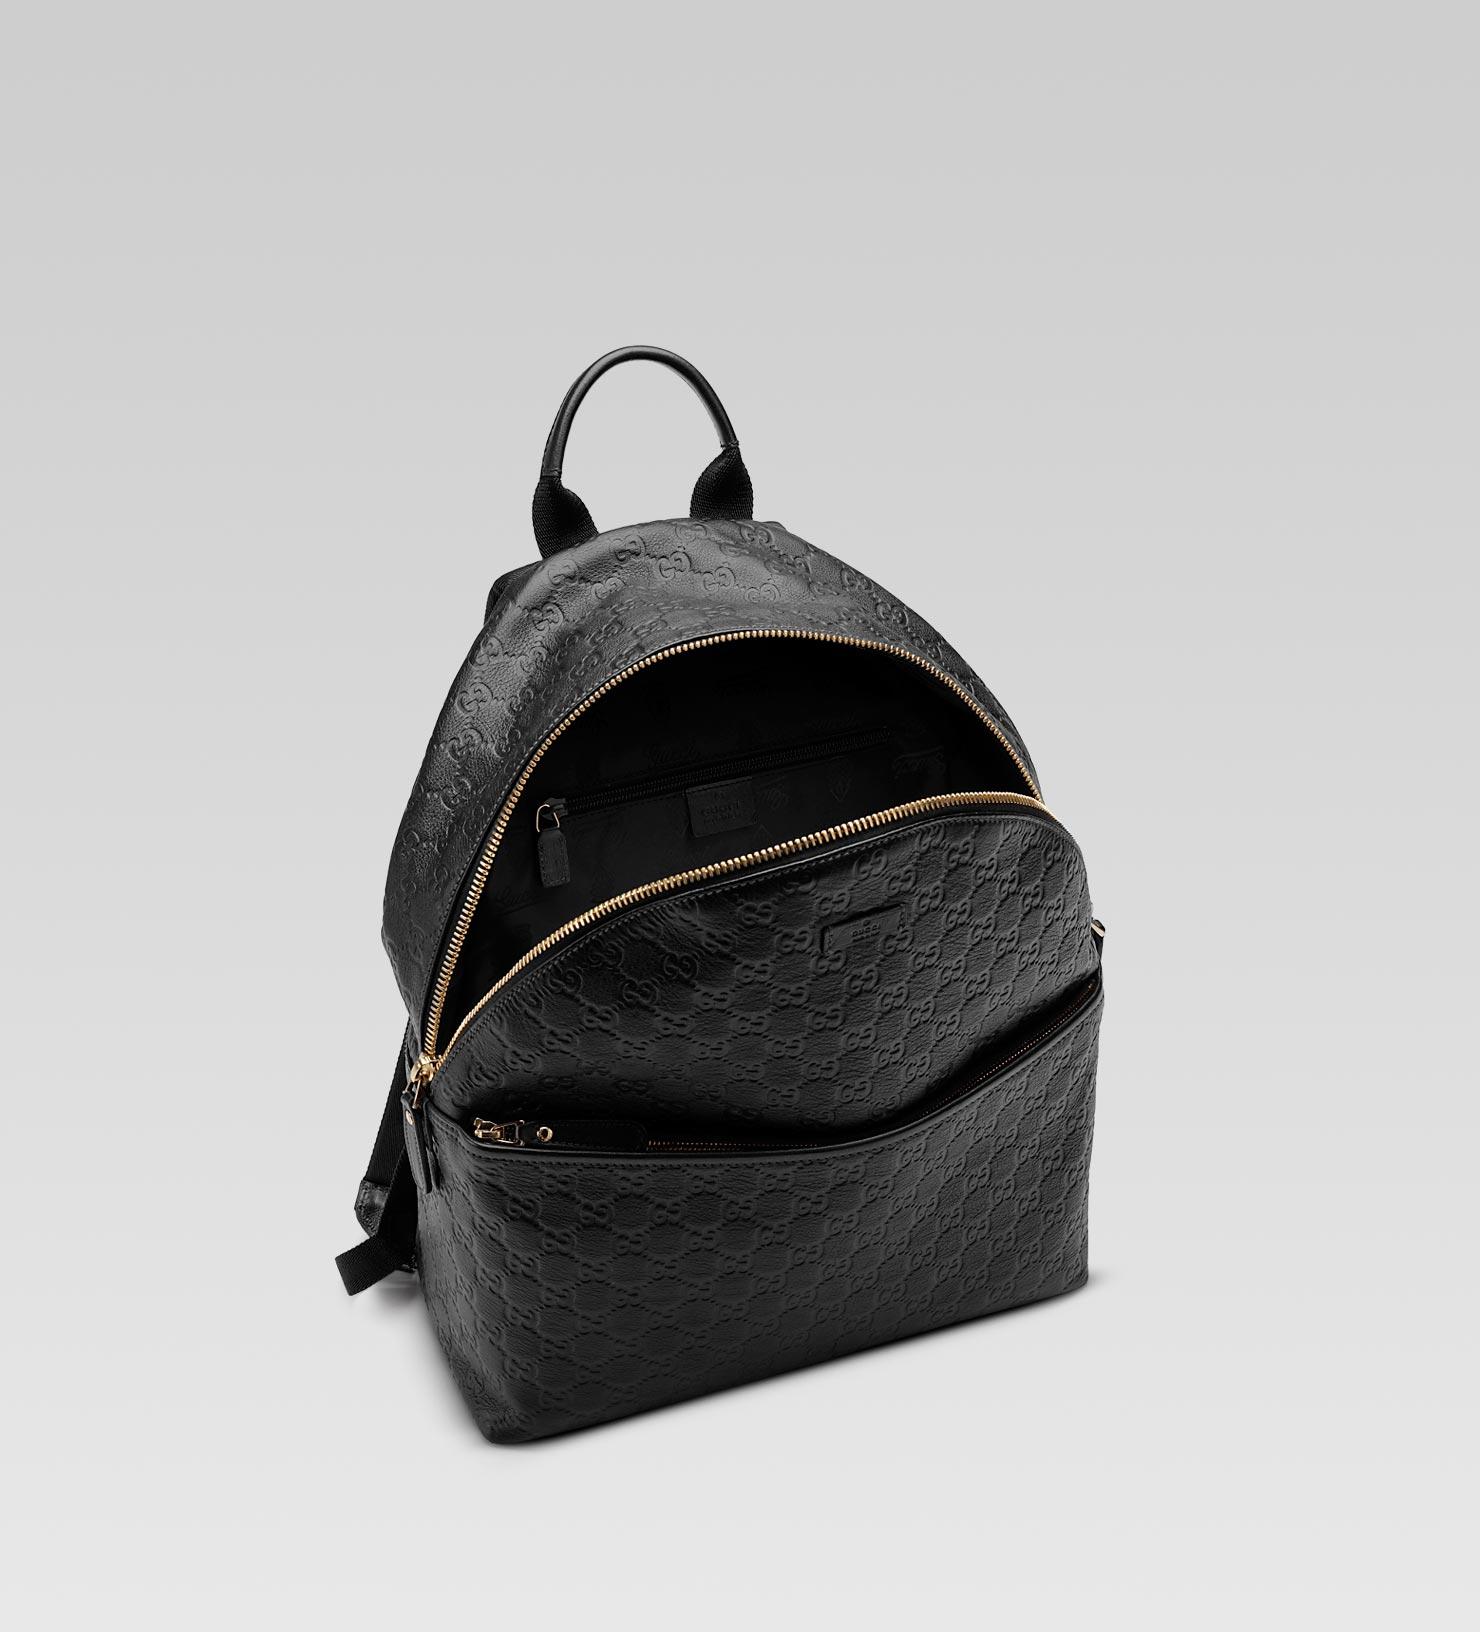 233501d5ea08 Lyst - Gucci Zip Backpack in Black for Men